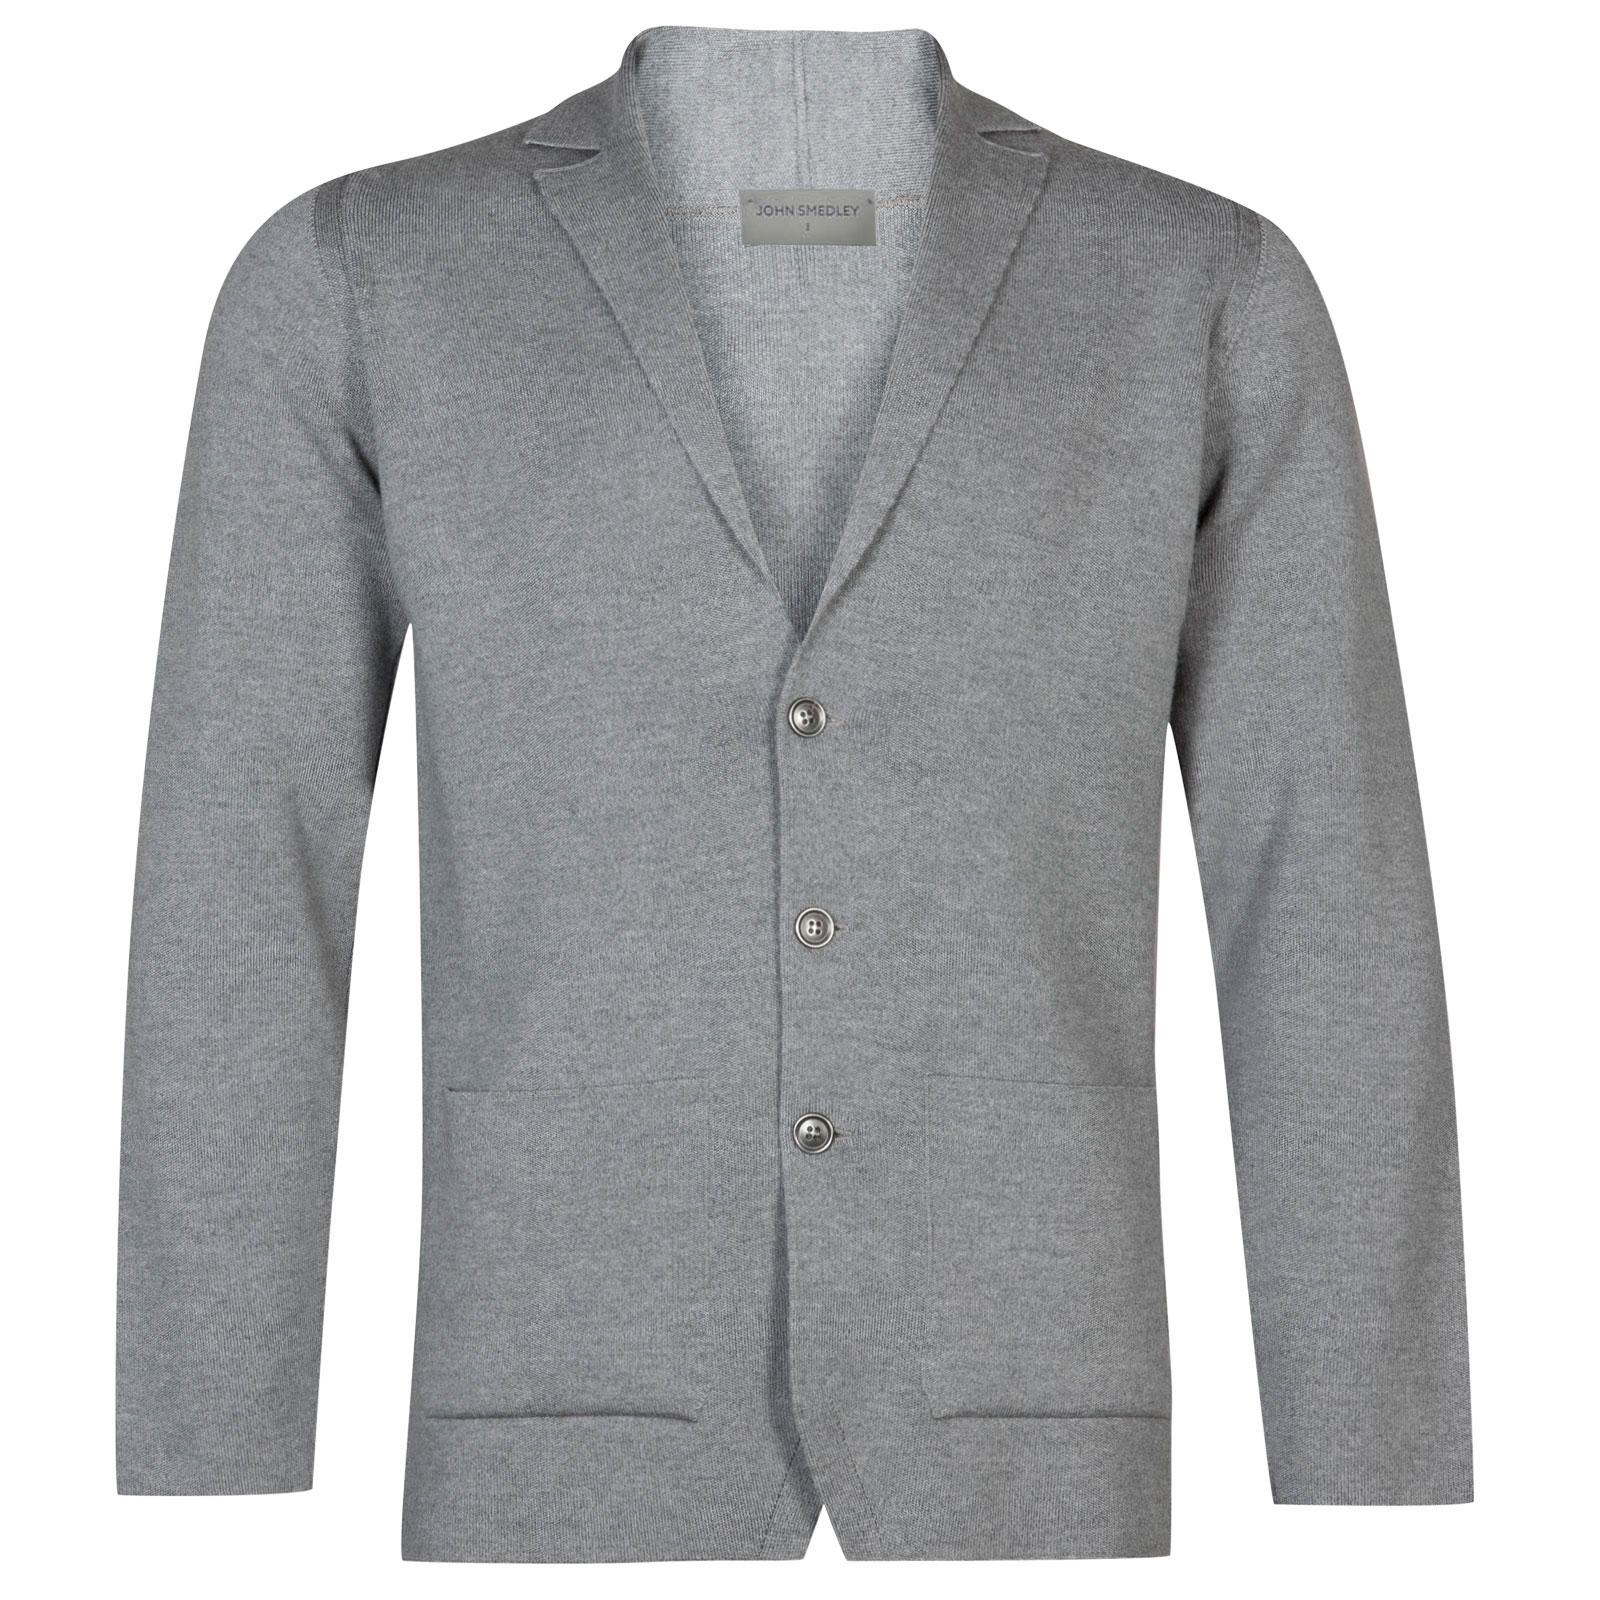 John Smedley Oxland Merino Wool Jacket in Silver-S